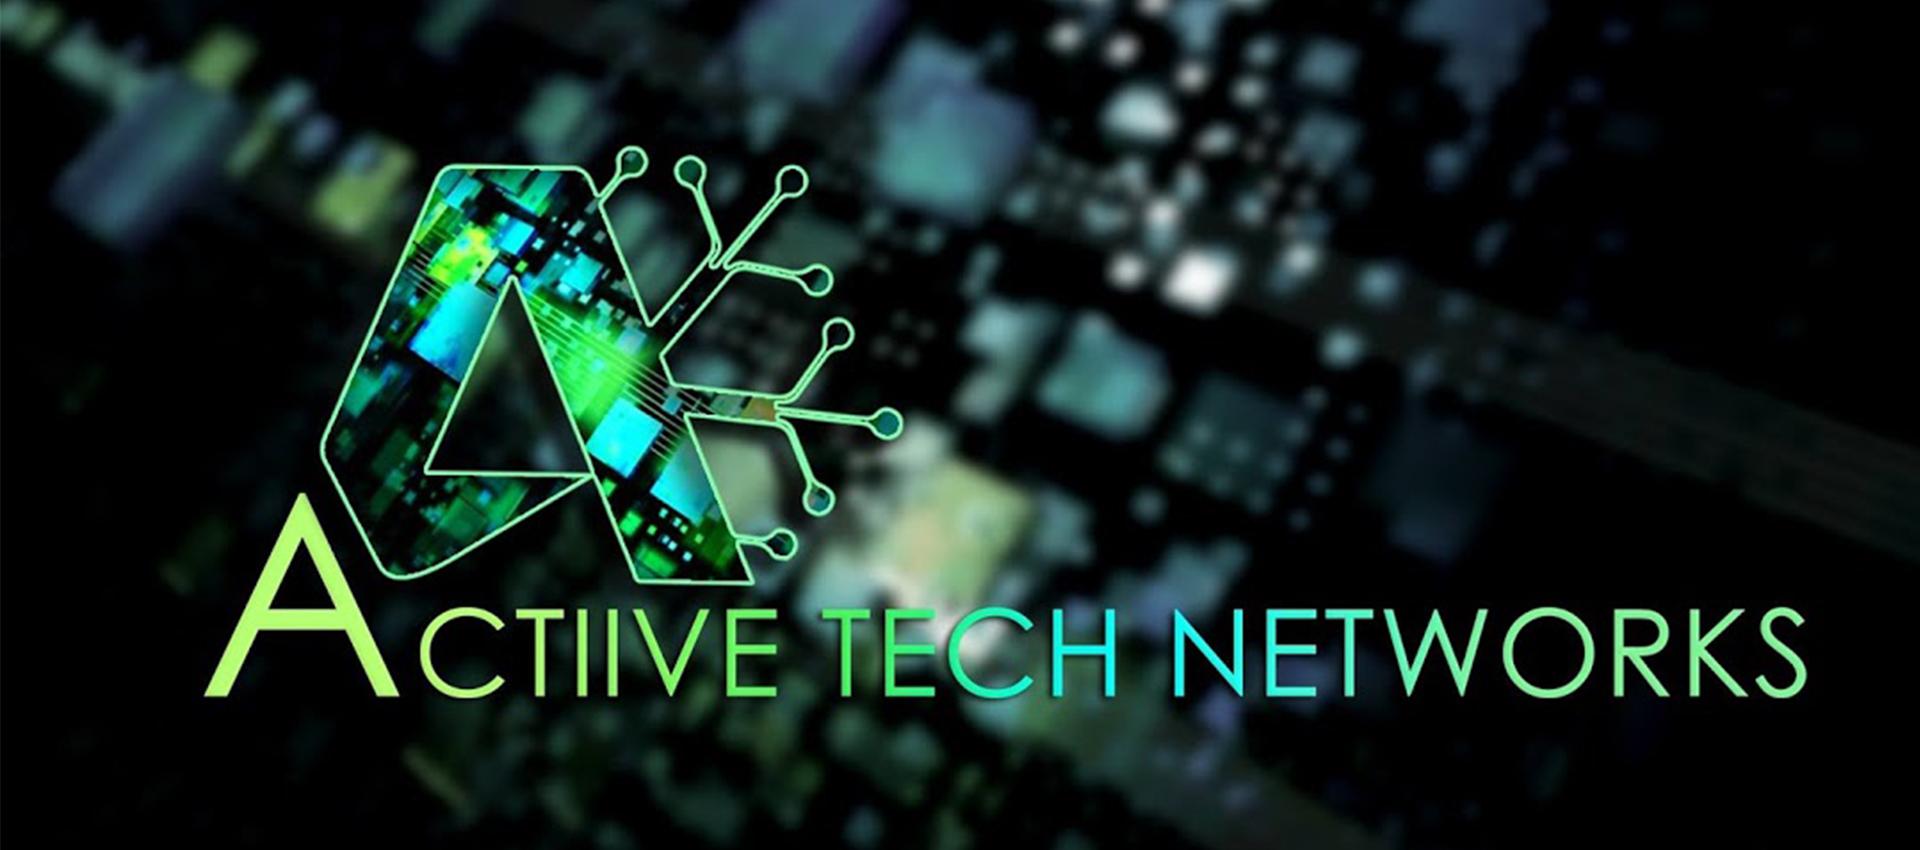 Yesman.lk - Cover Image - Actiive Tech Networks